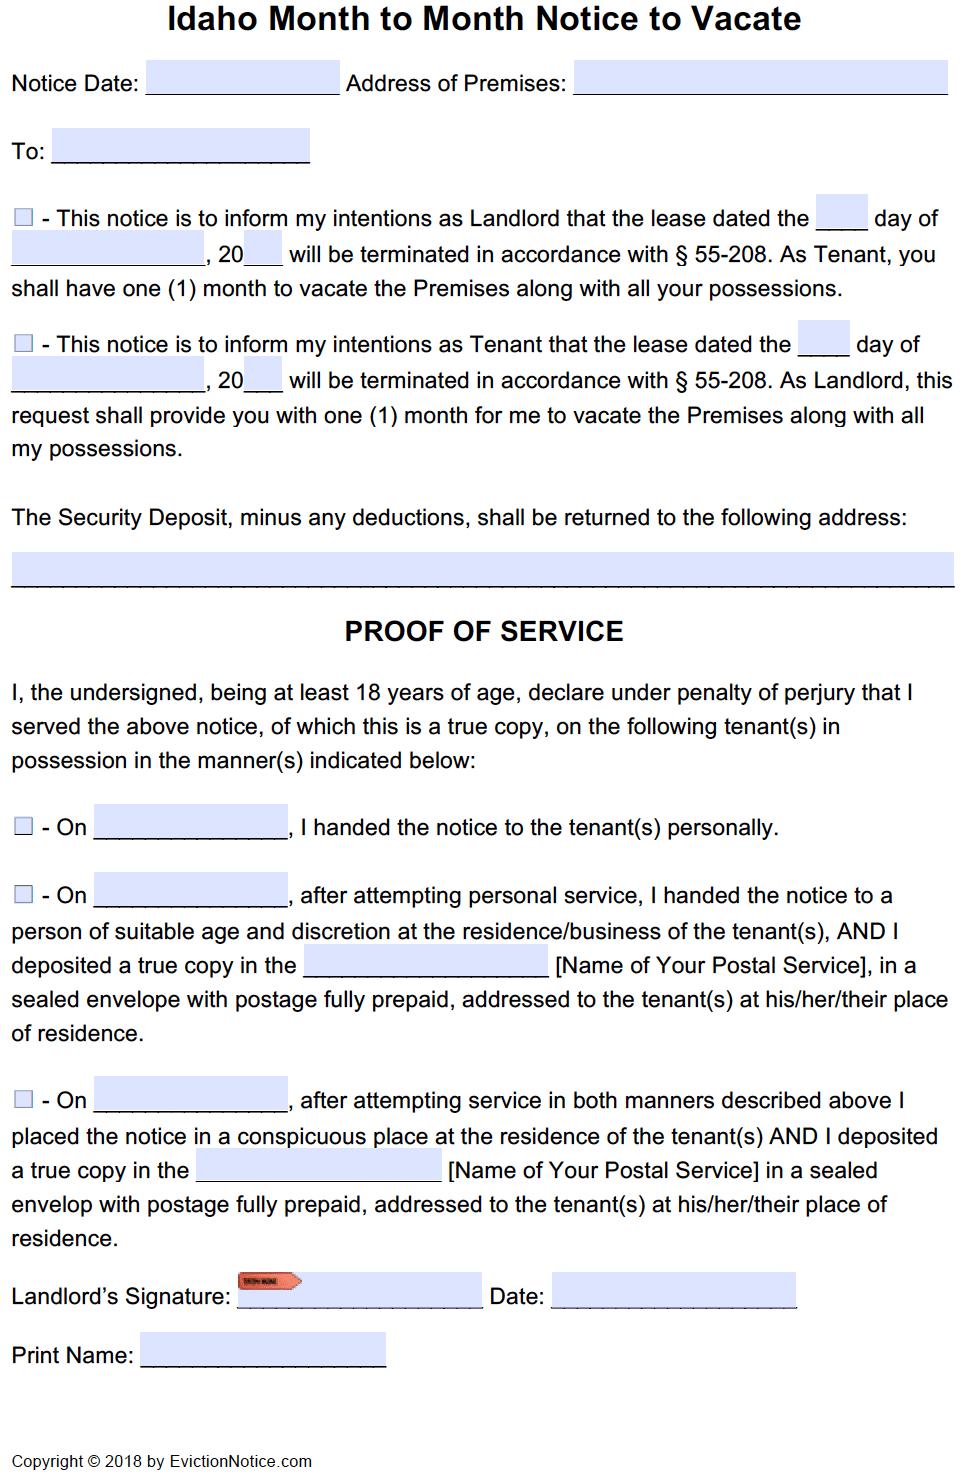 Free Idaho Eviction Notice Templates Id Eviction Process